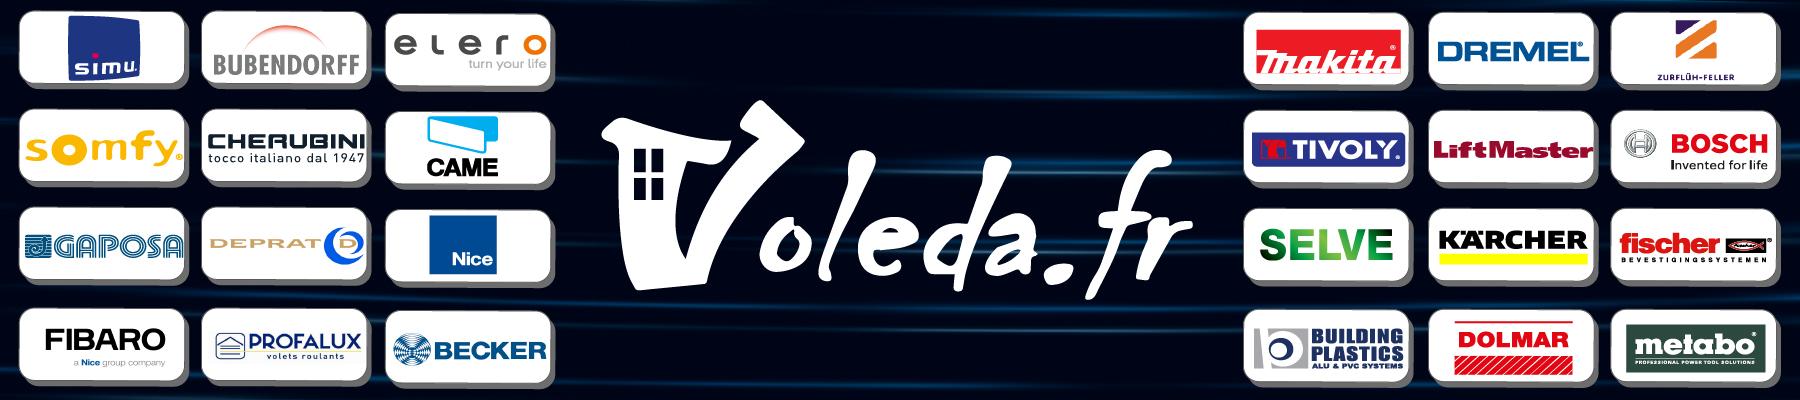 Somfy, Cherubini, Nice, Makita, Gaposa, Bubendorff, Simu, Fibaro, Bosch: Voleda.fr distributeur des plus grandes marques